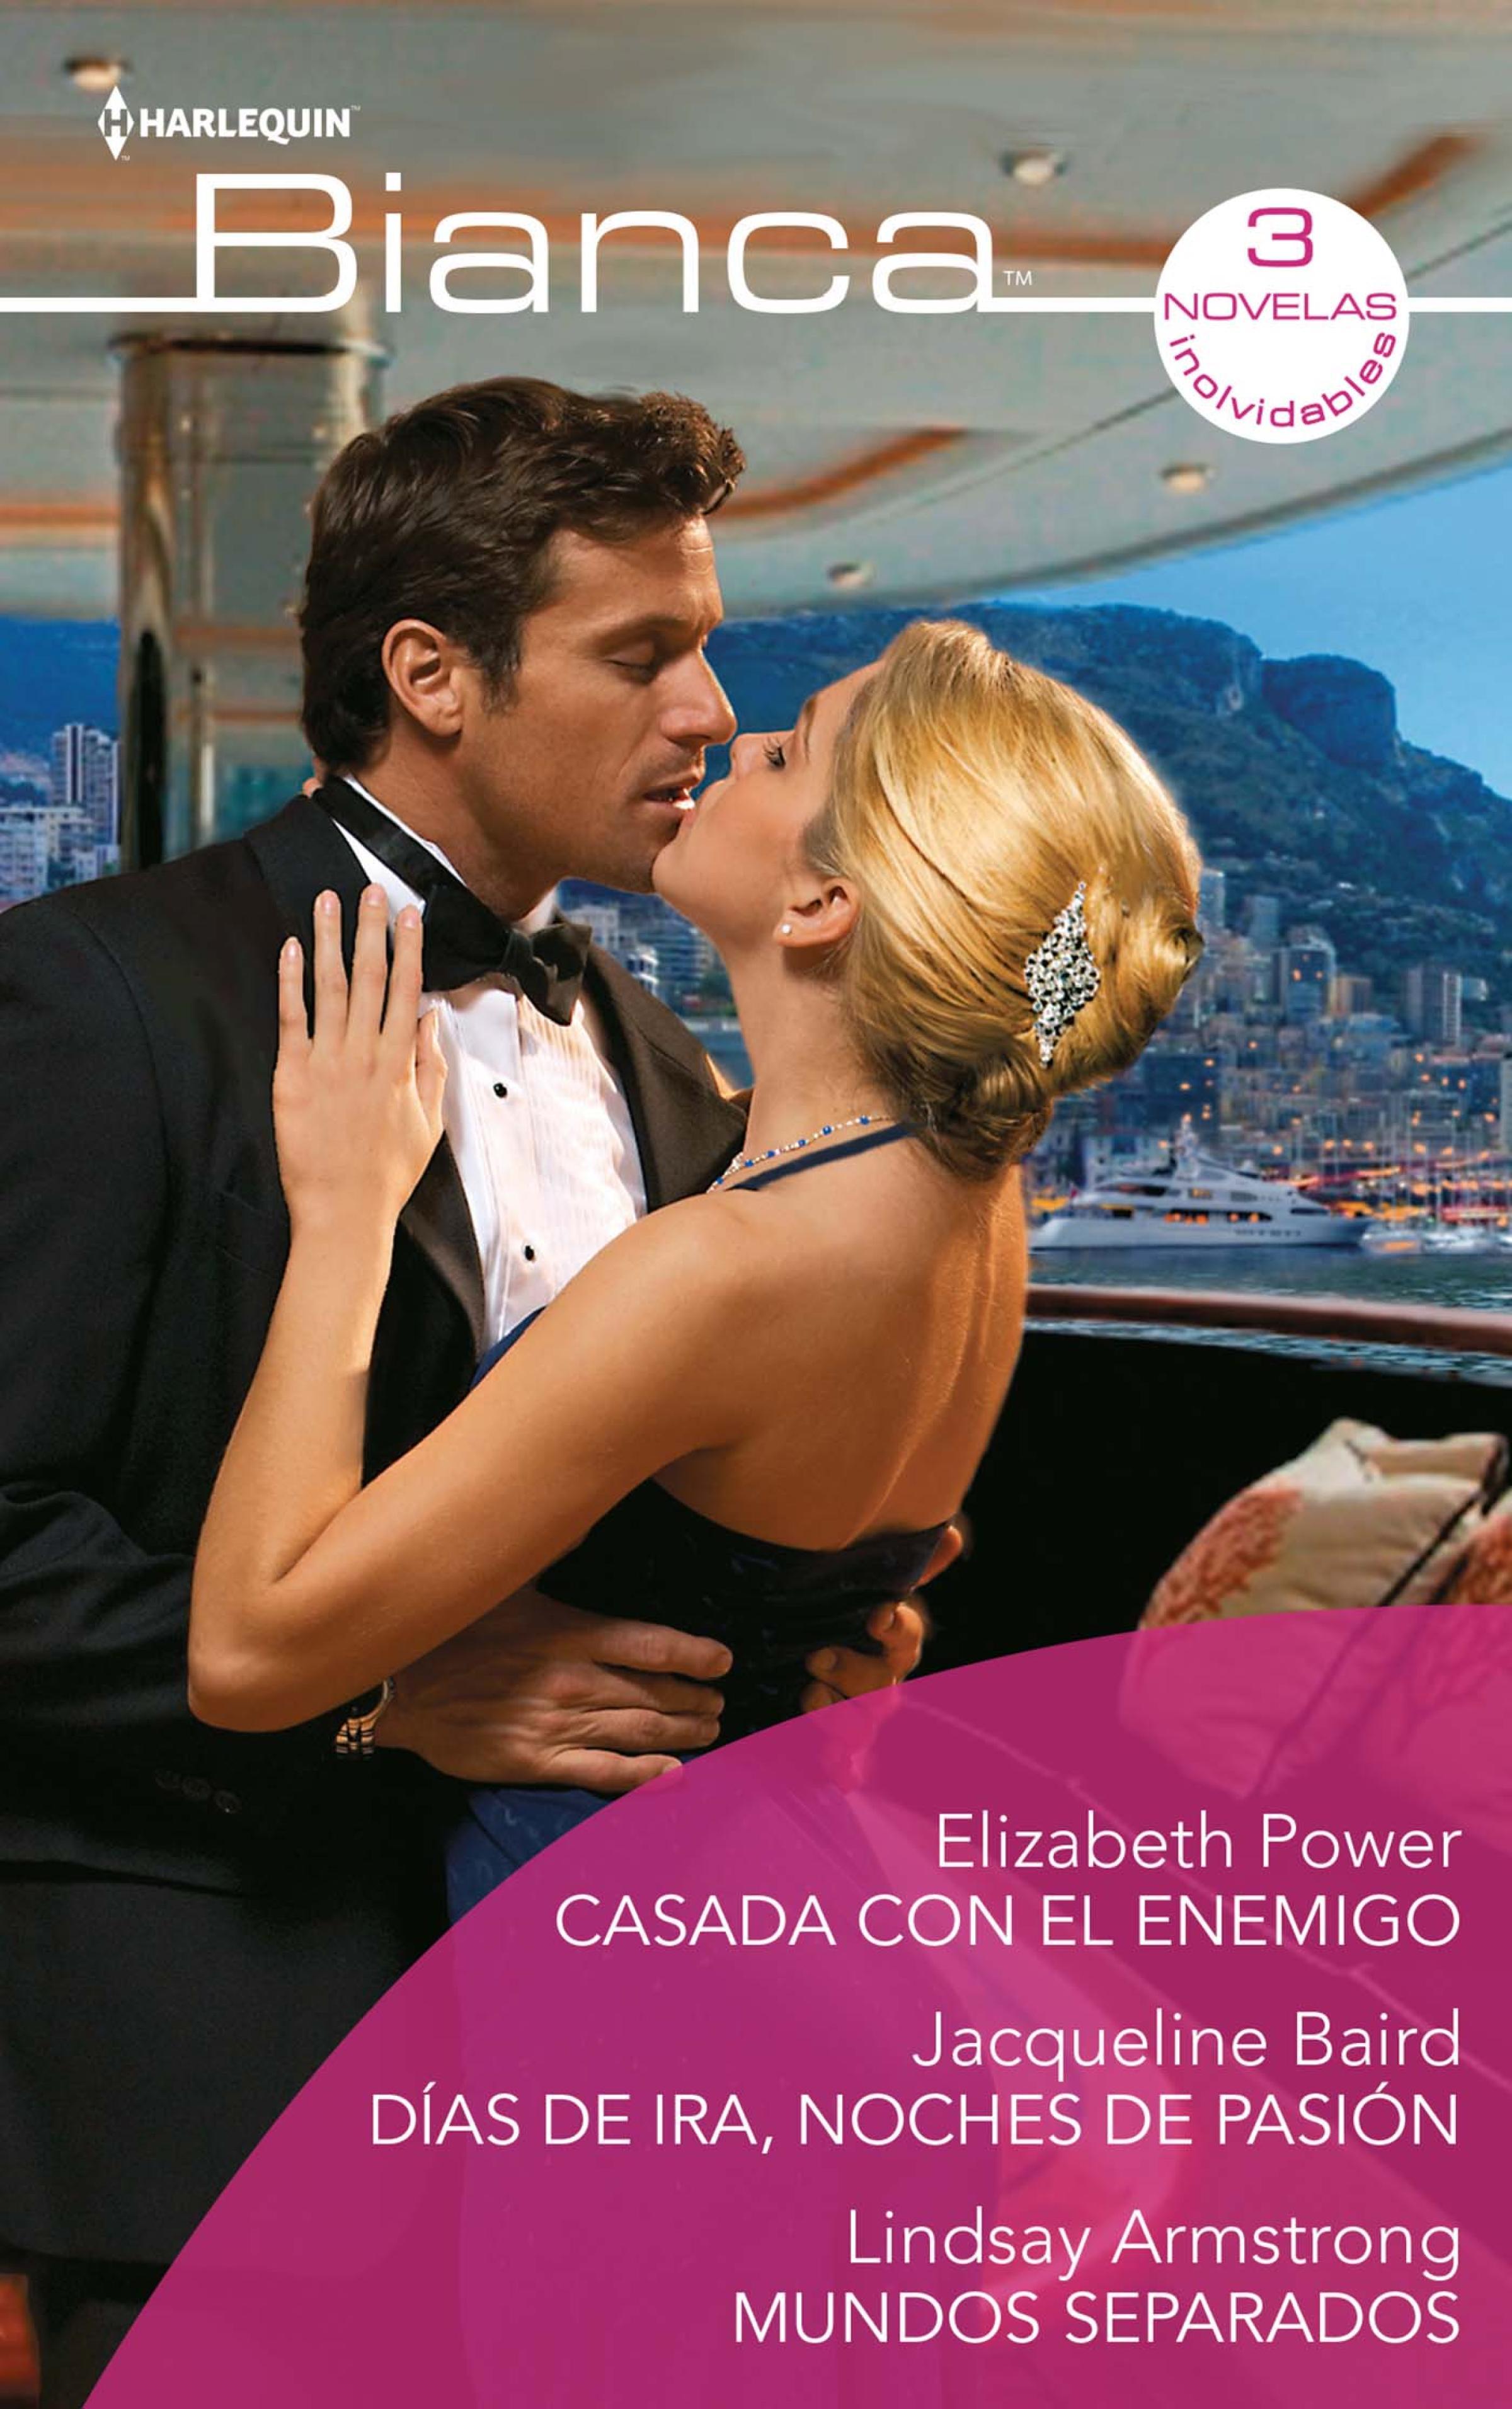 Jacqueline Baird Casada con el enemigo - Días de ira, noches de pasión - Mundos separados casada maxiwell 3